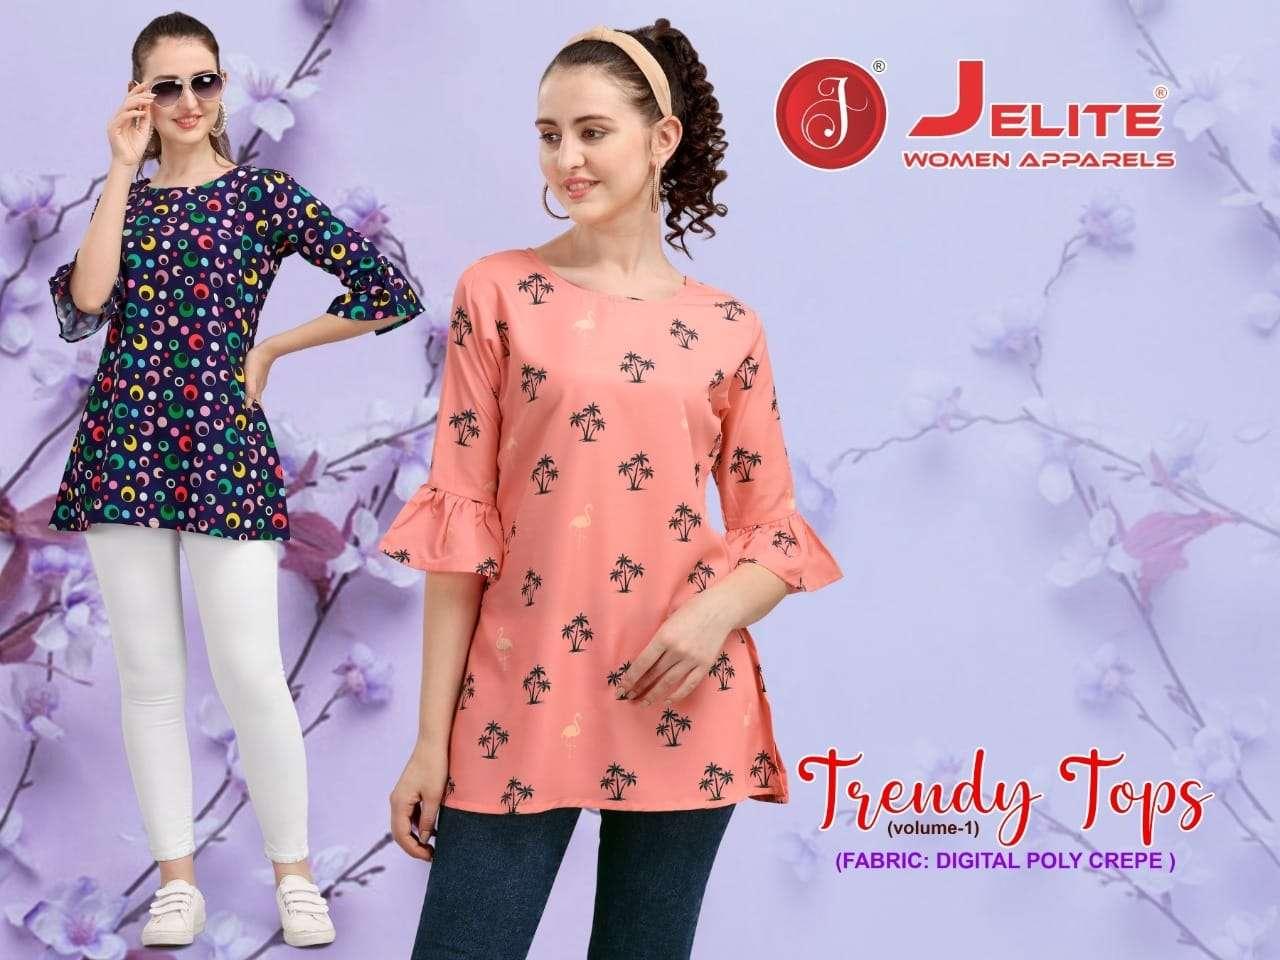 Jelite Trendy Tops Vol 1 Printed Crepe Short tops Catalog Supplier